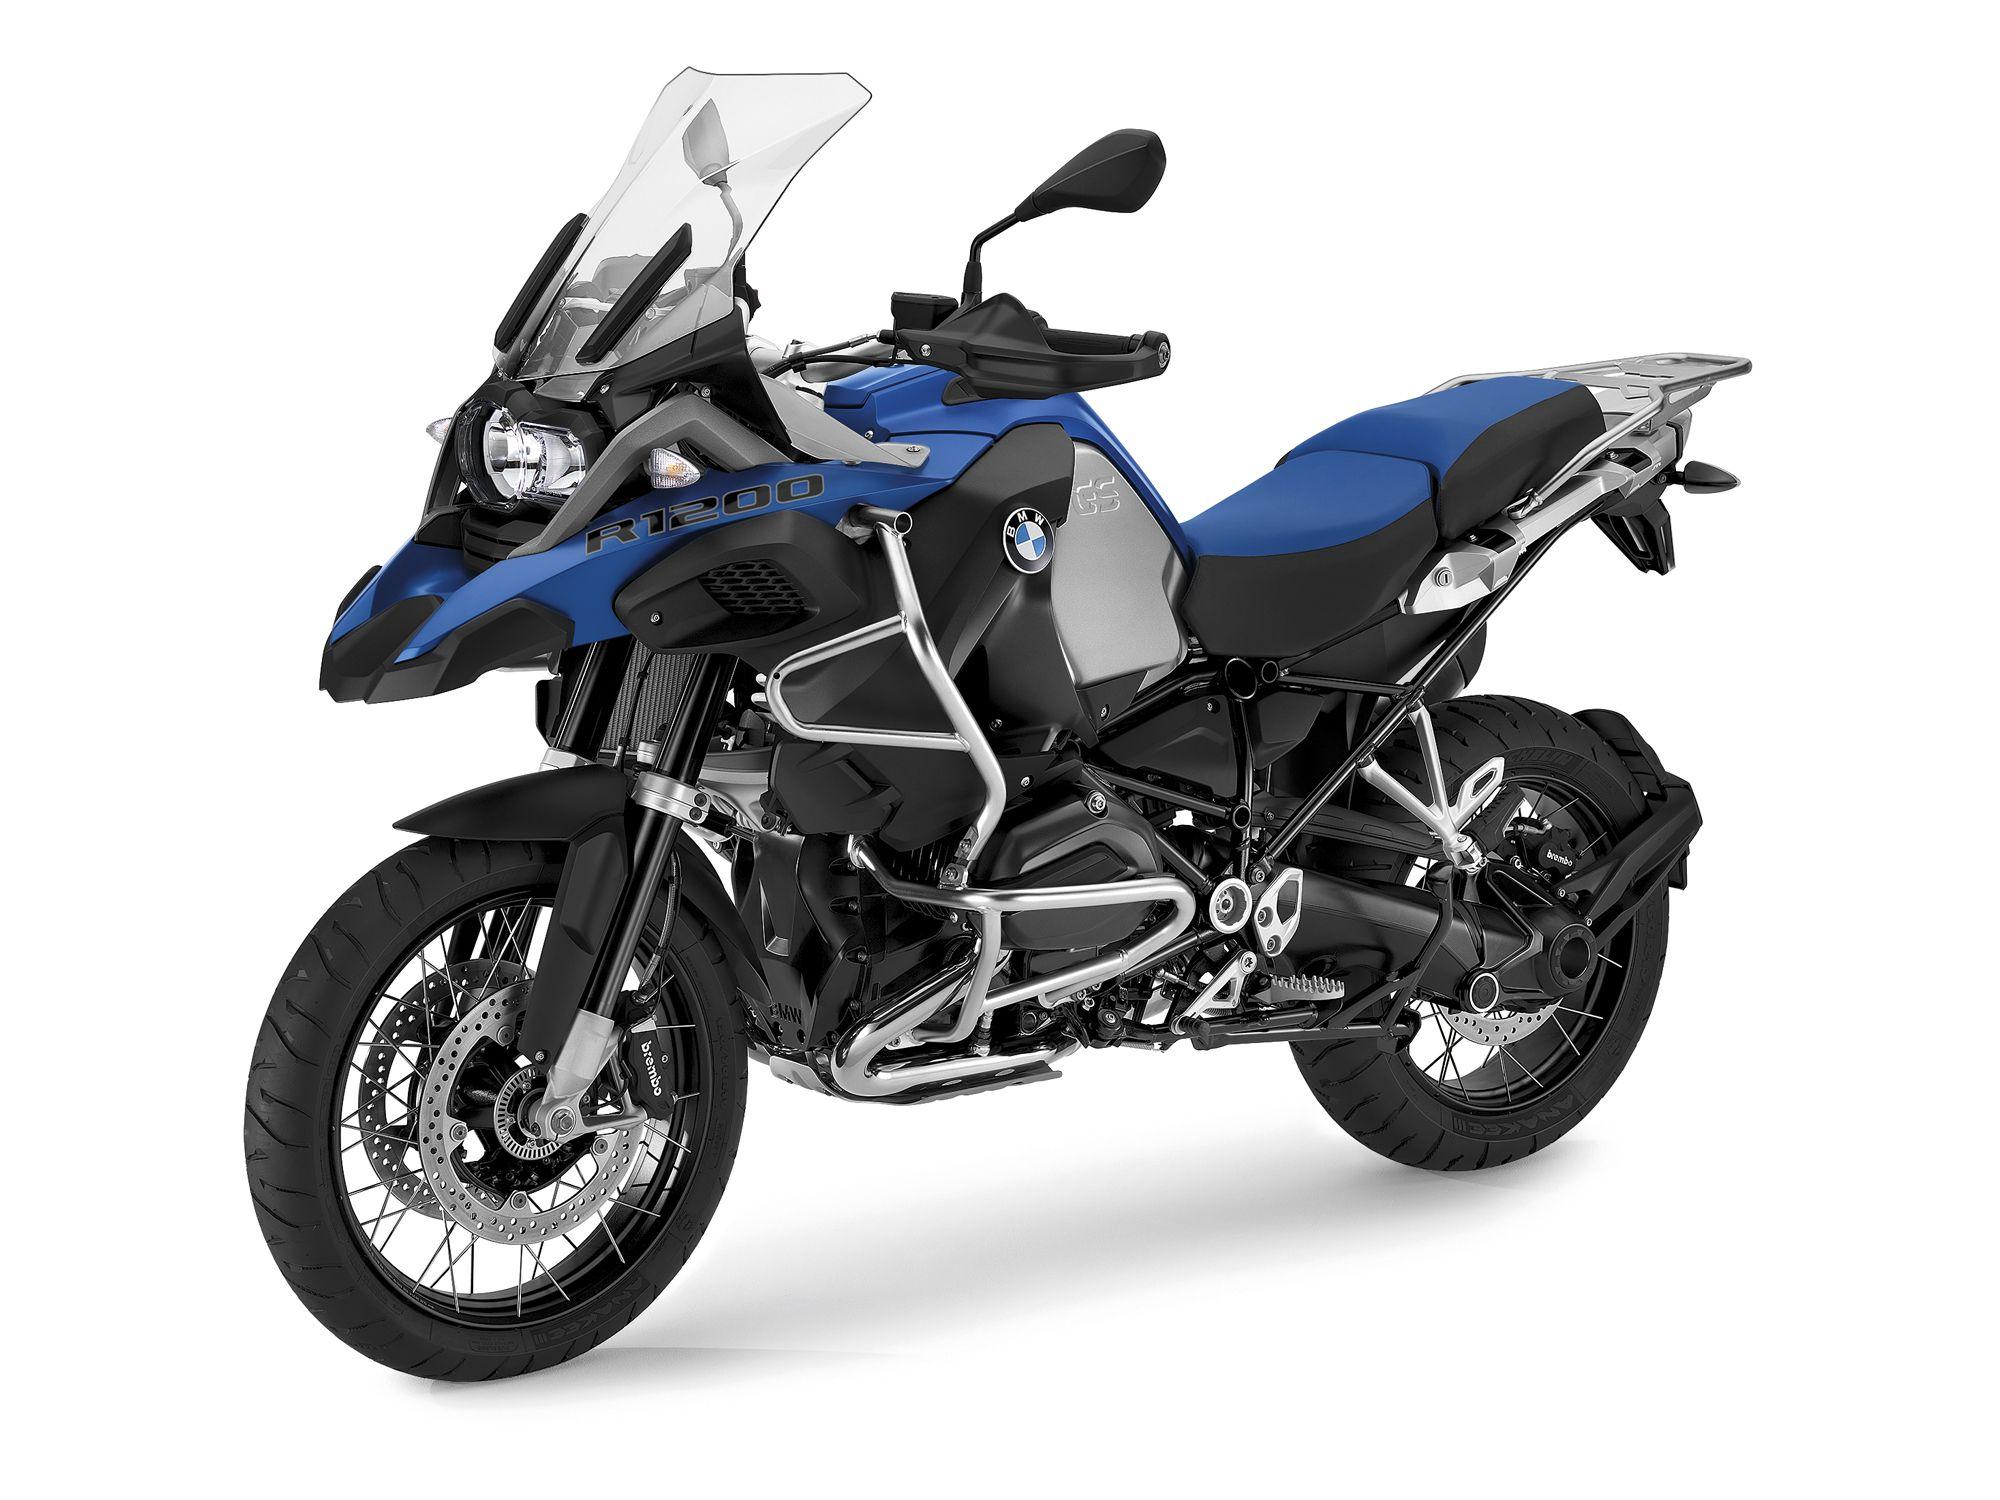 bmw r 1200 gs adventure motocicletas pinterest. Black Bedroom Furniture Sets. Home Design Ideas